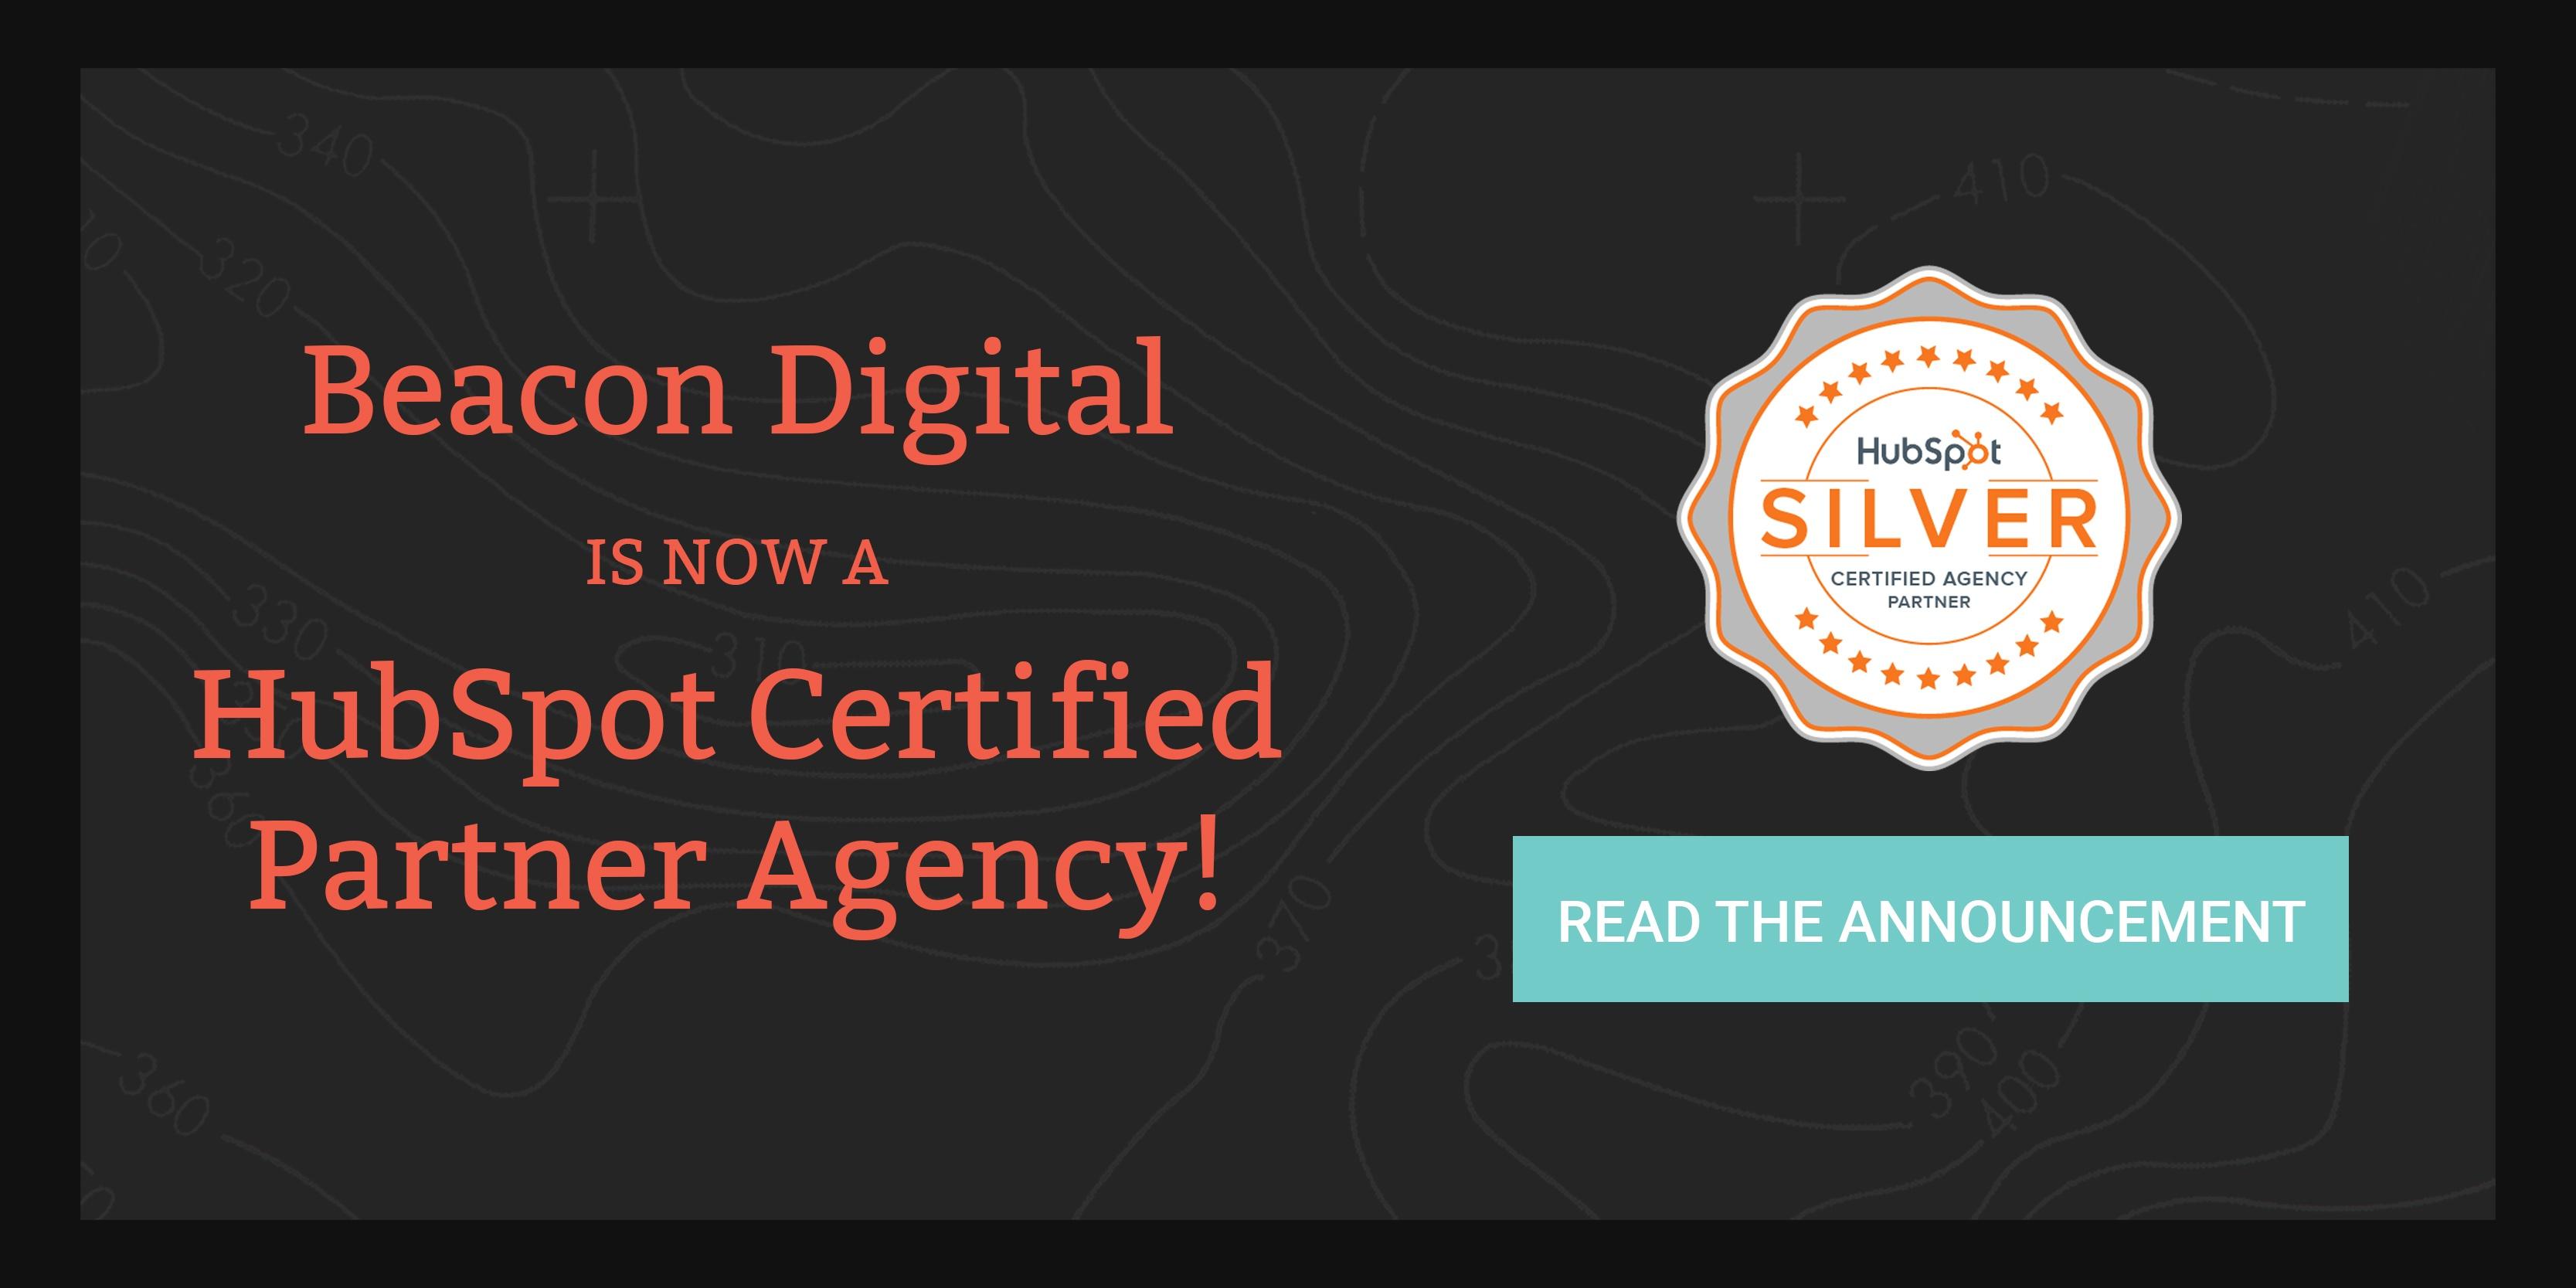 Beacon Digital Marketing Becomes a HubSpot Silver Partner Agency